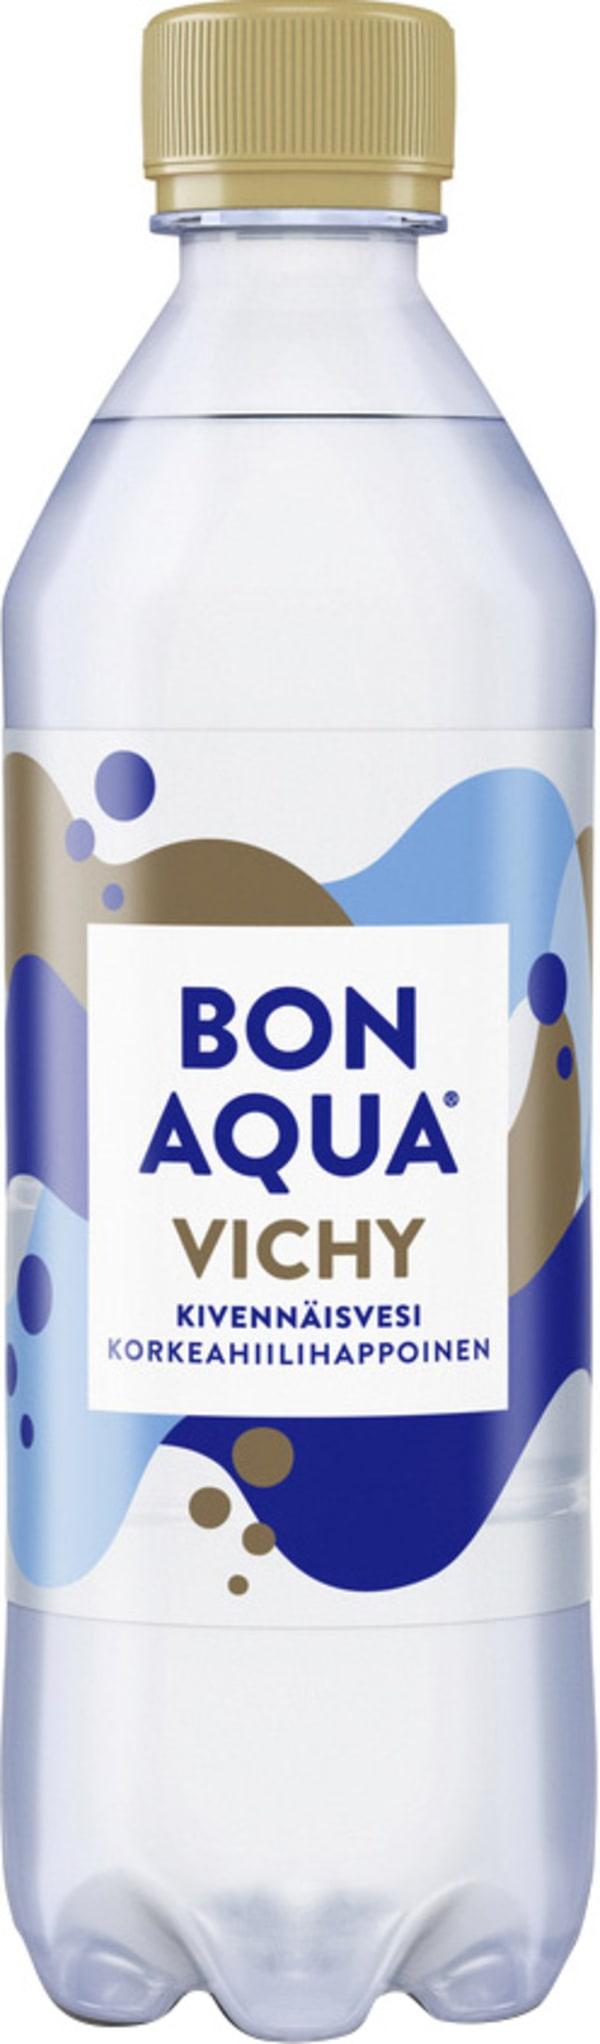 Bonaqua Vichy muovipullo